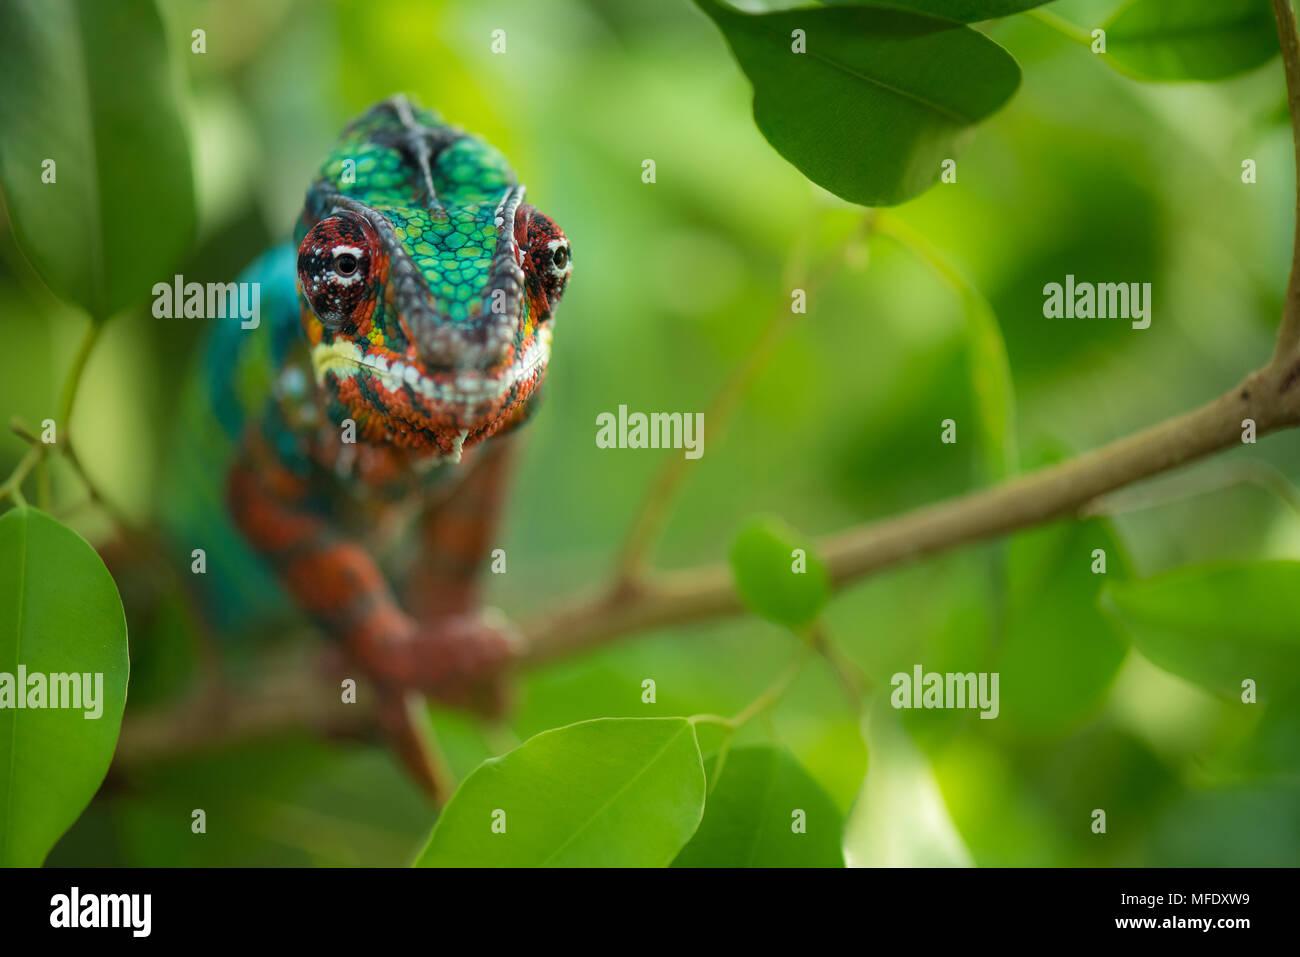 Panther chameleon with bright colors / Ambilobe / Madagascar wildlife / Furcifer pardalis / chameleon on branch - Stock Image